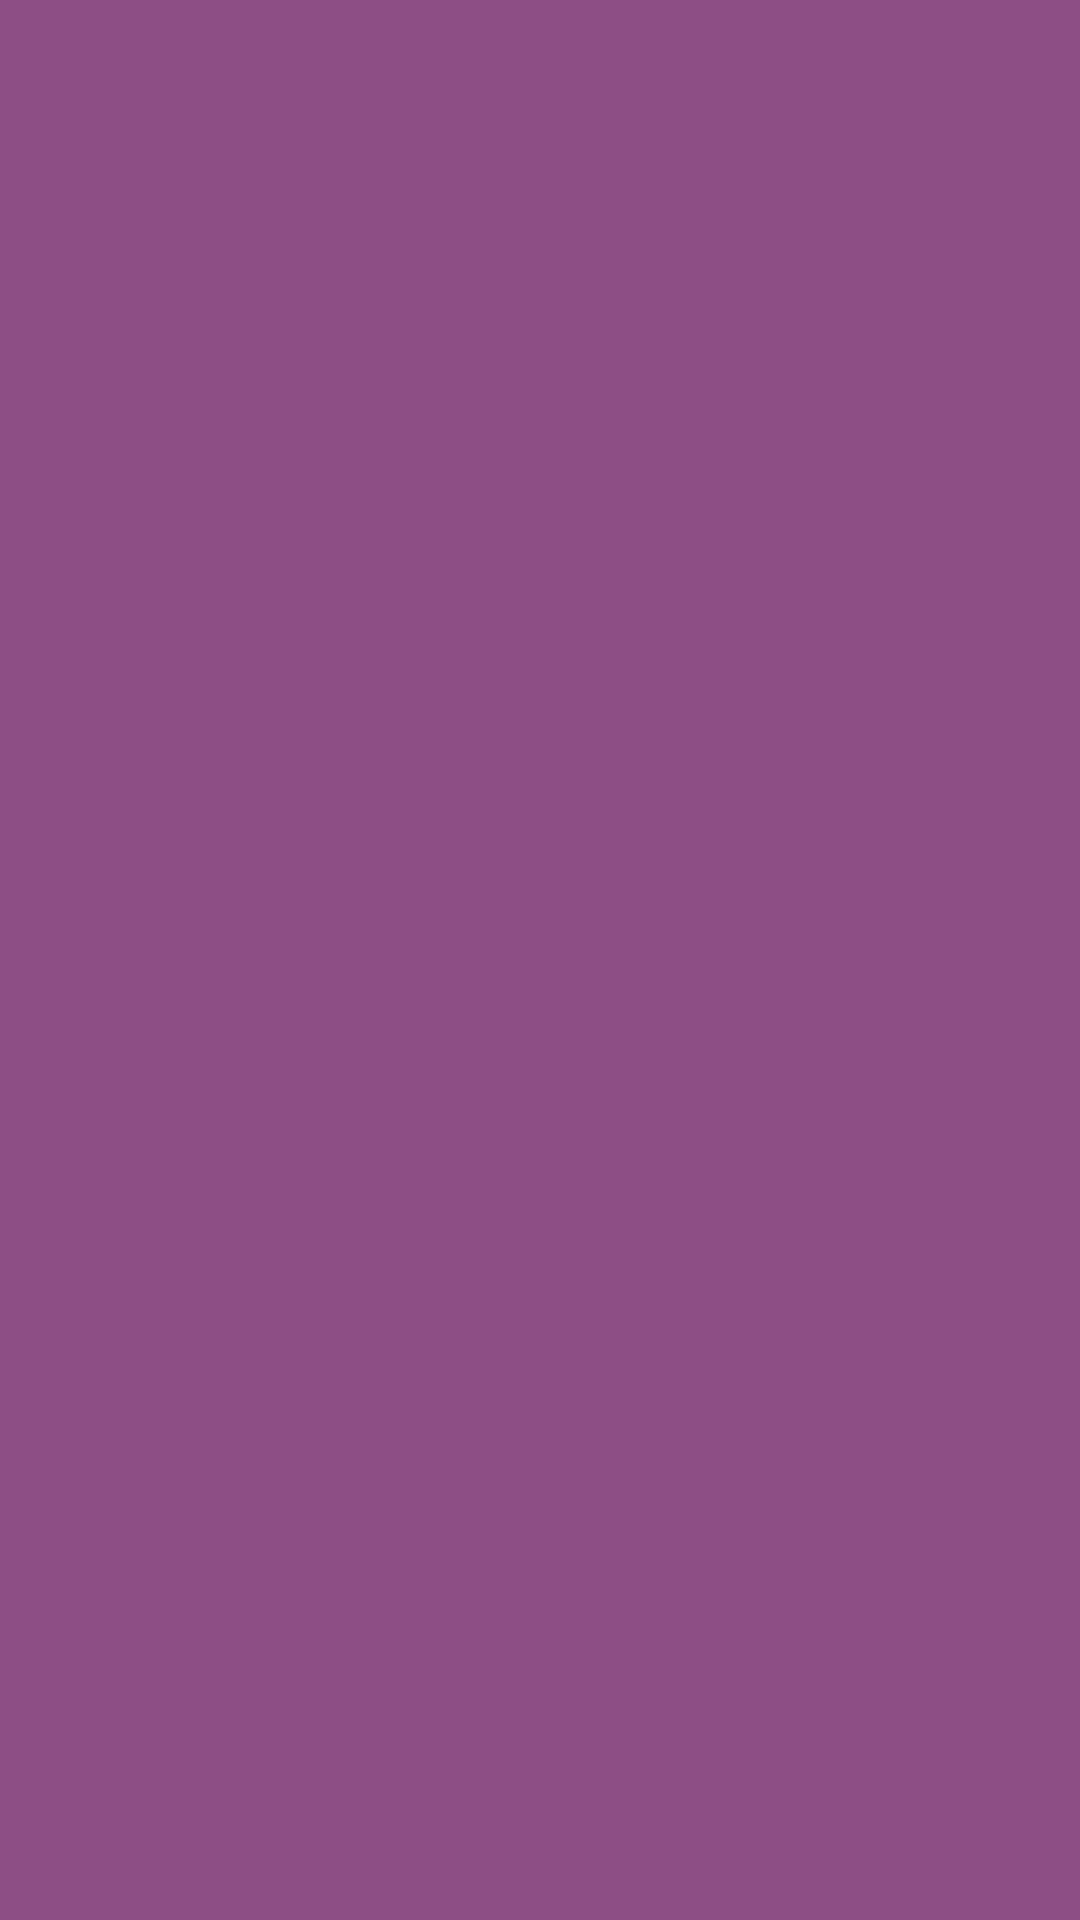 1080x1920 Razzmic Berry Solid Color Background